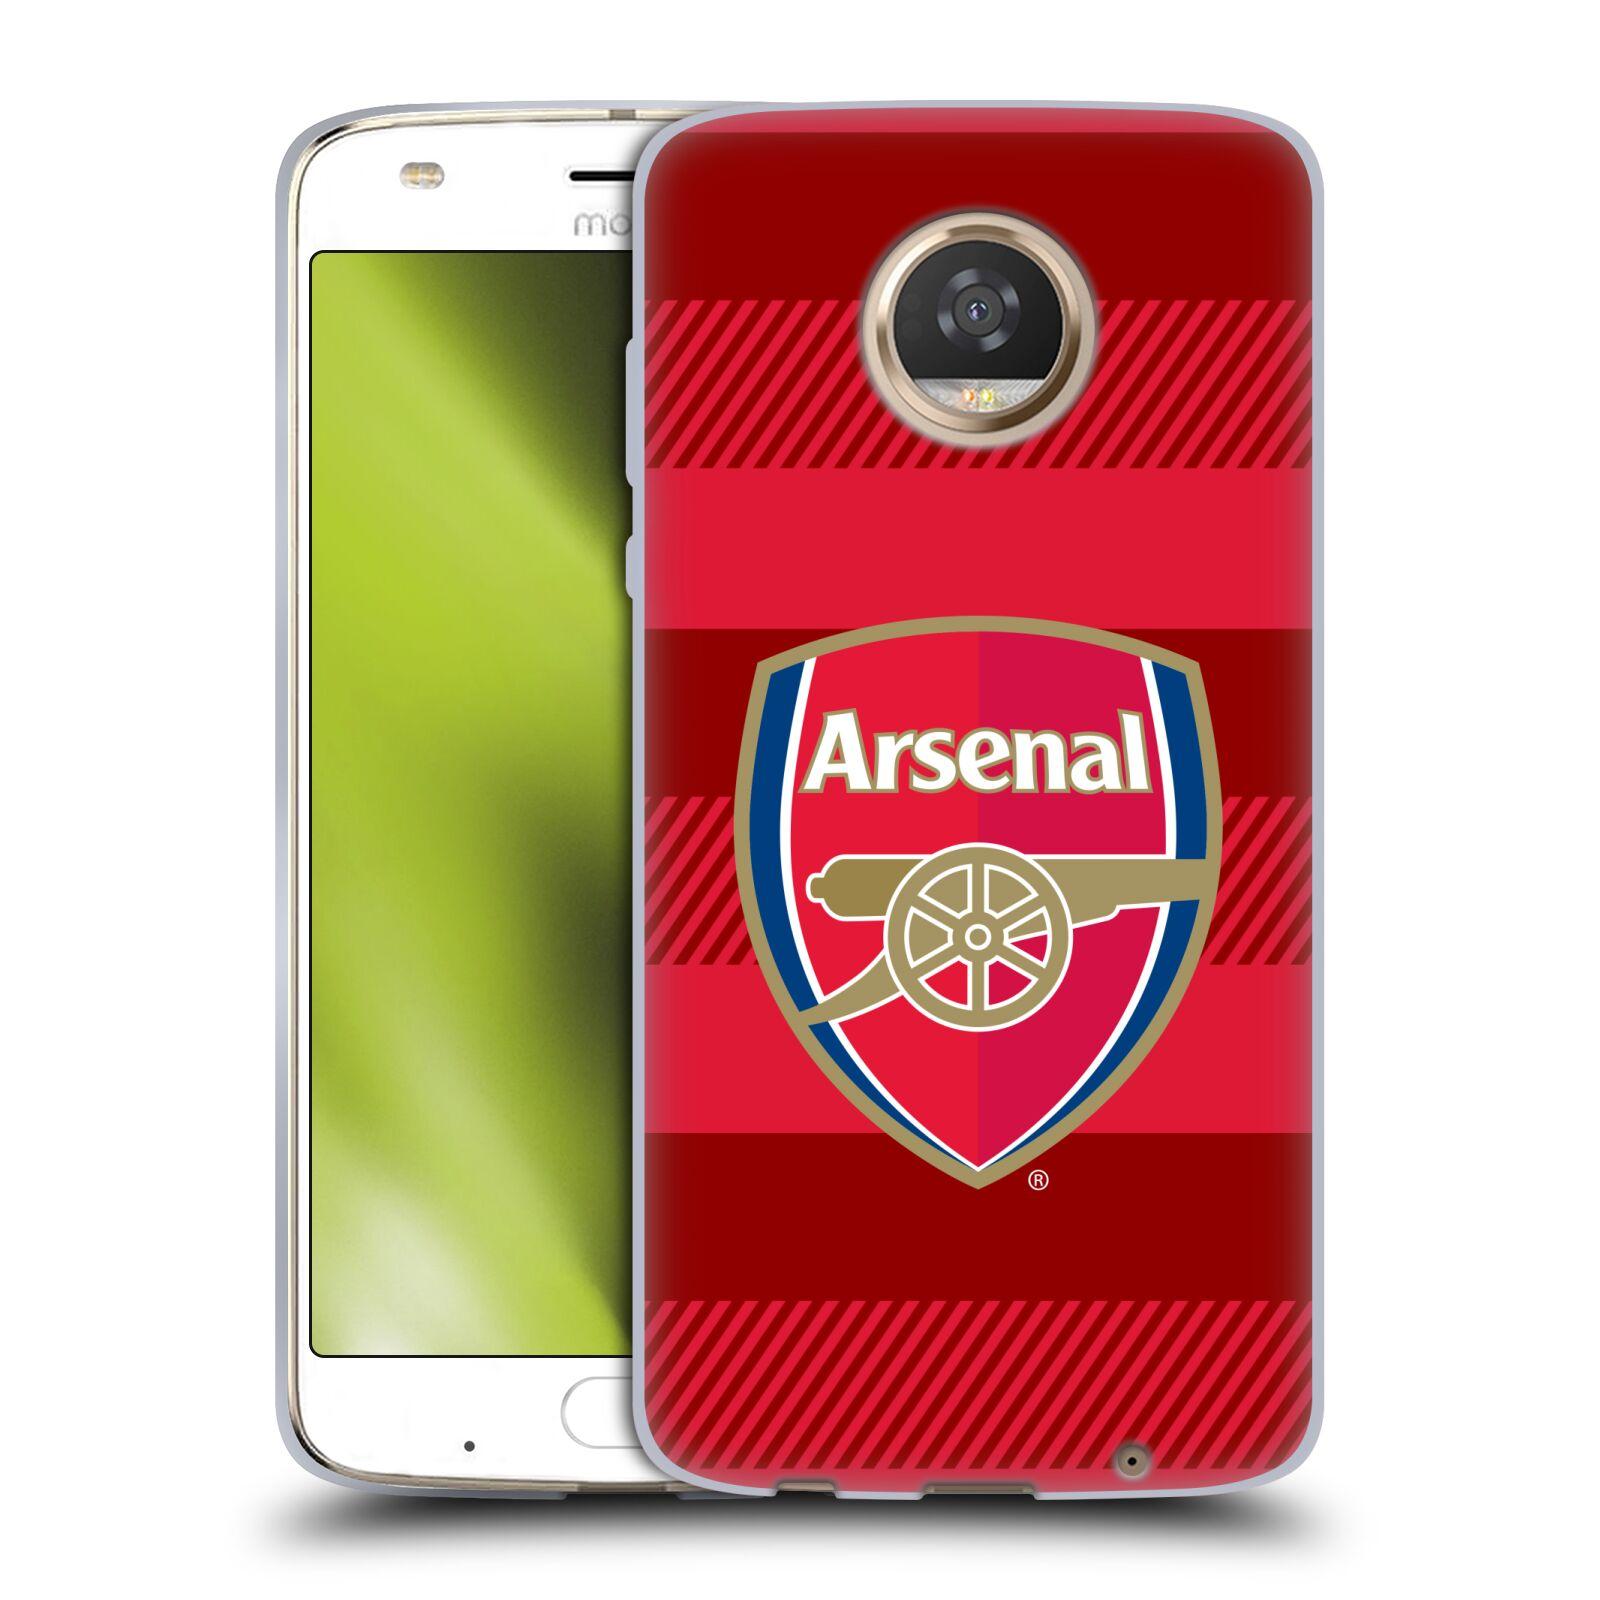 Silikonové pouzdro na mobil Lenovo Moto Z2 Play - Head Case - Arsenal FC - Logo s pruhy